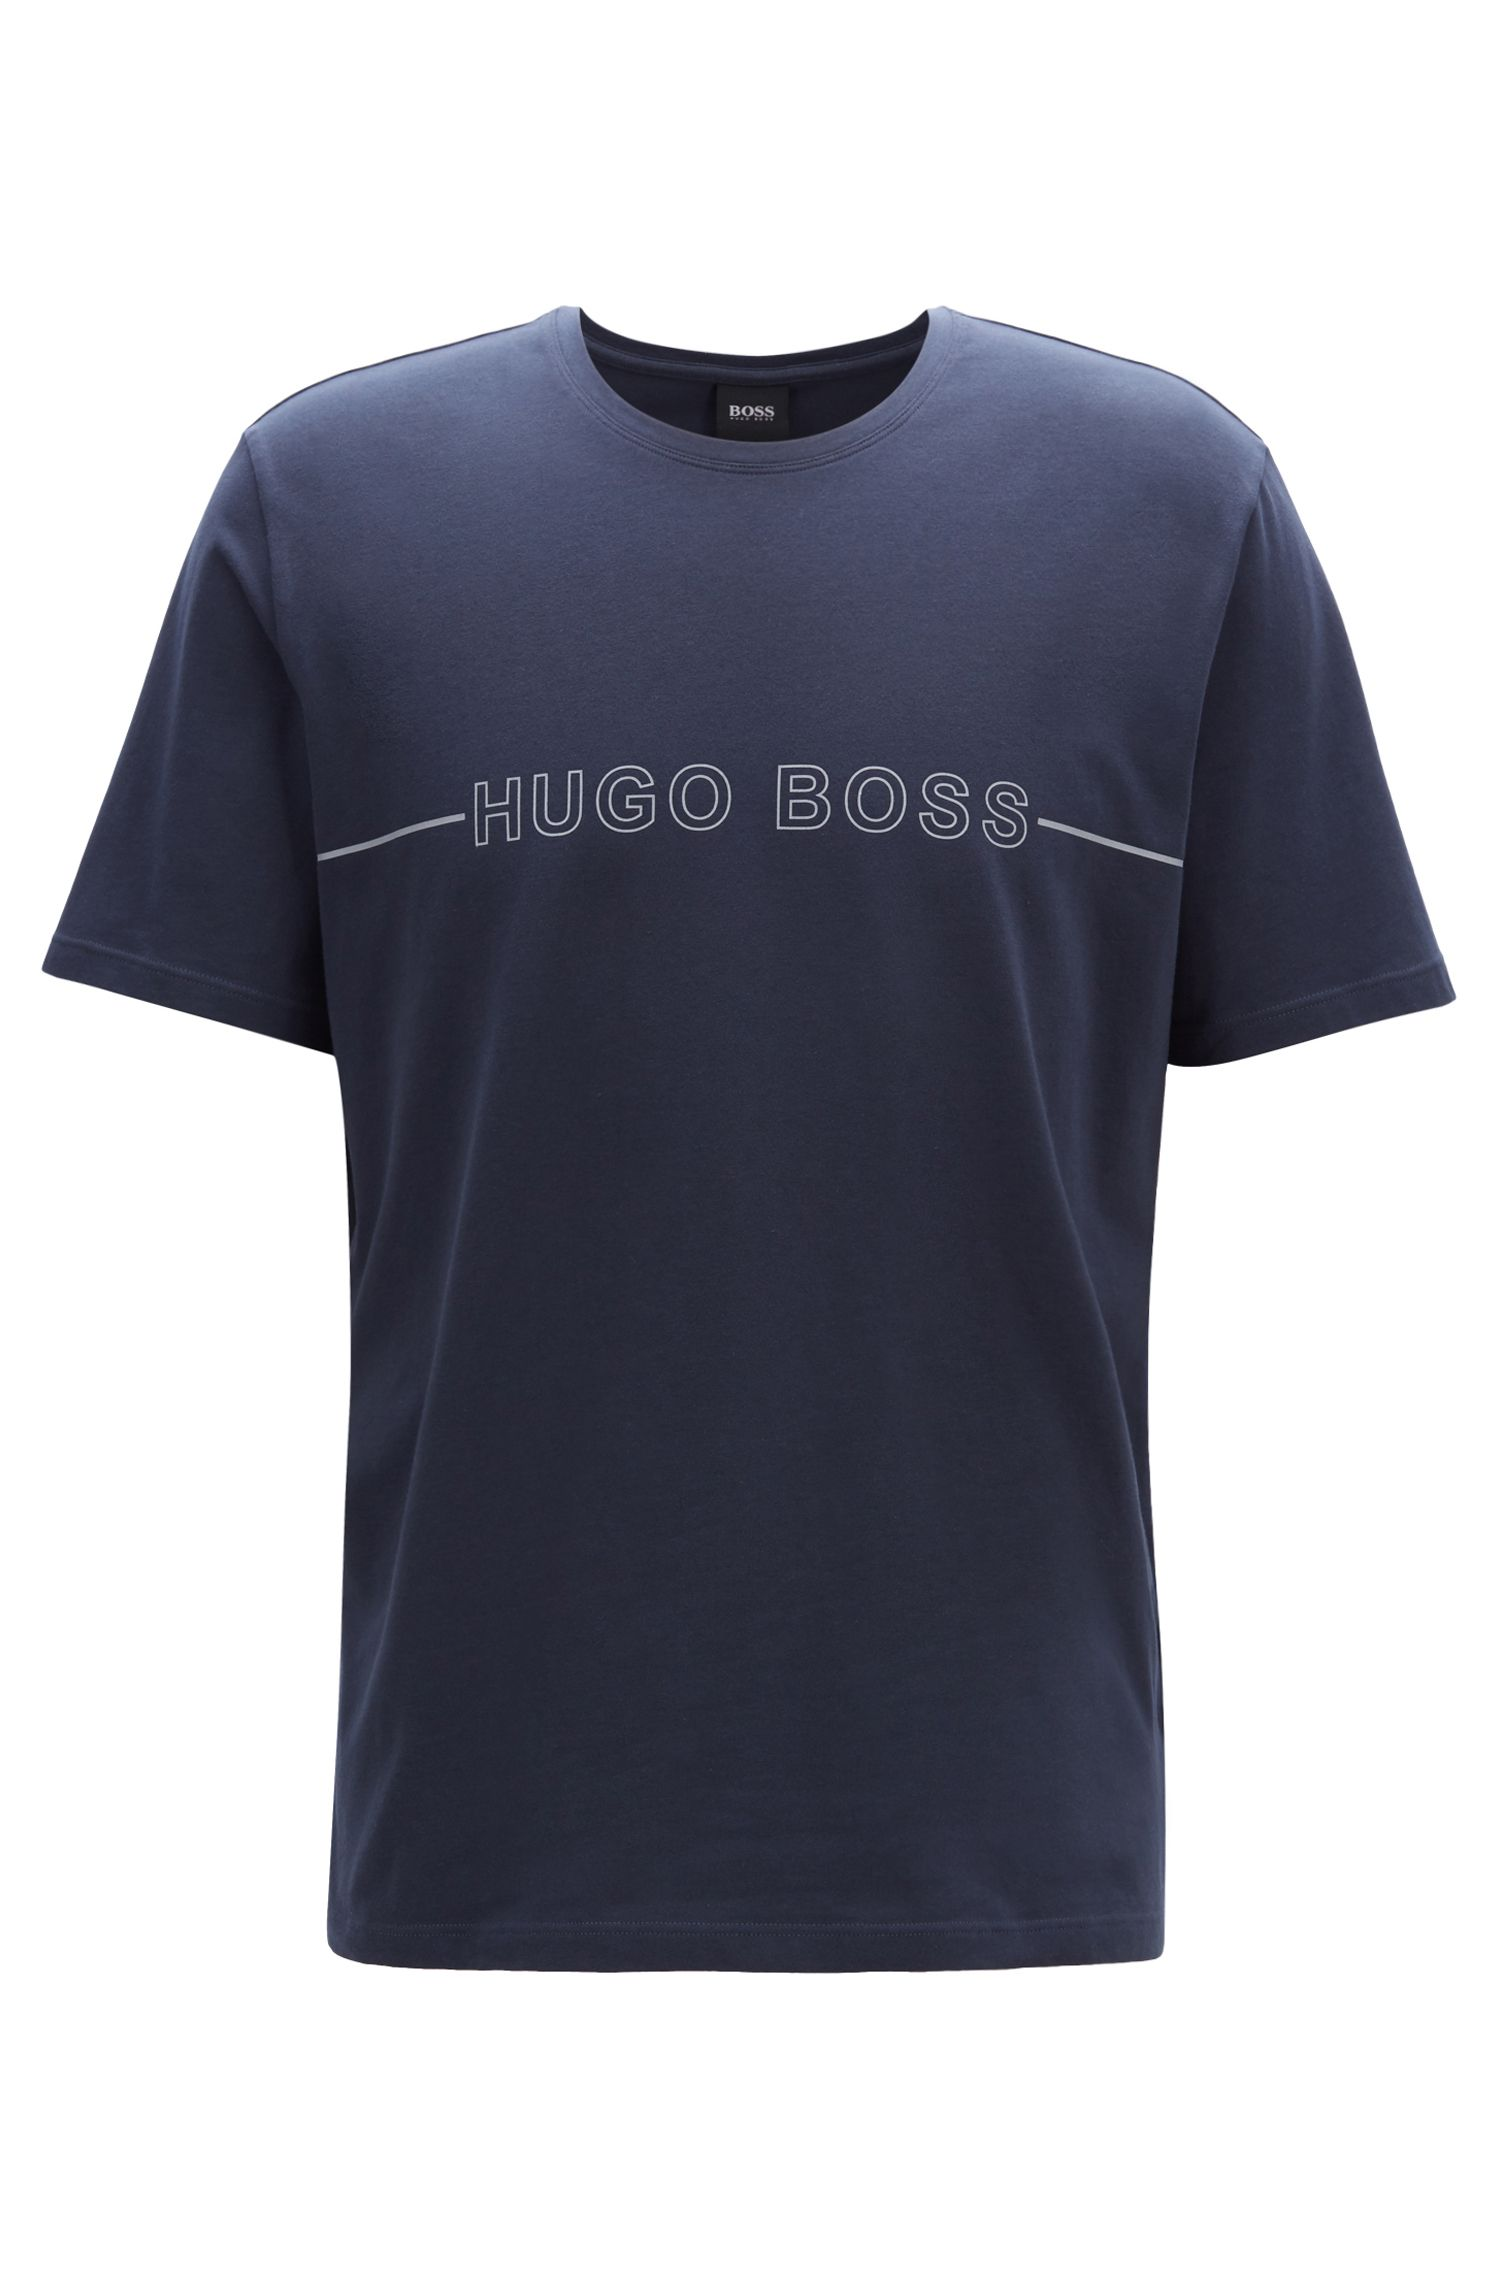 Camiseta de pijama en punto de algodón elástico con logo, Azul oscuro